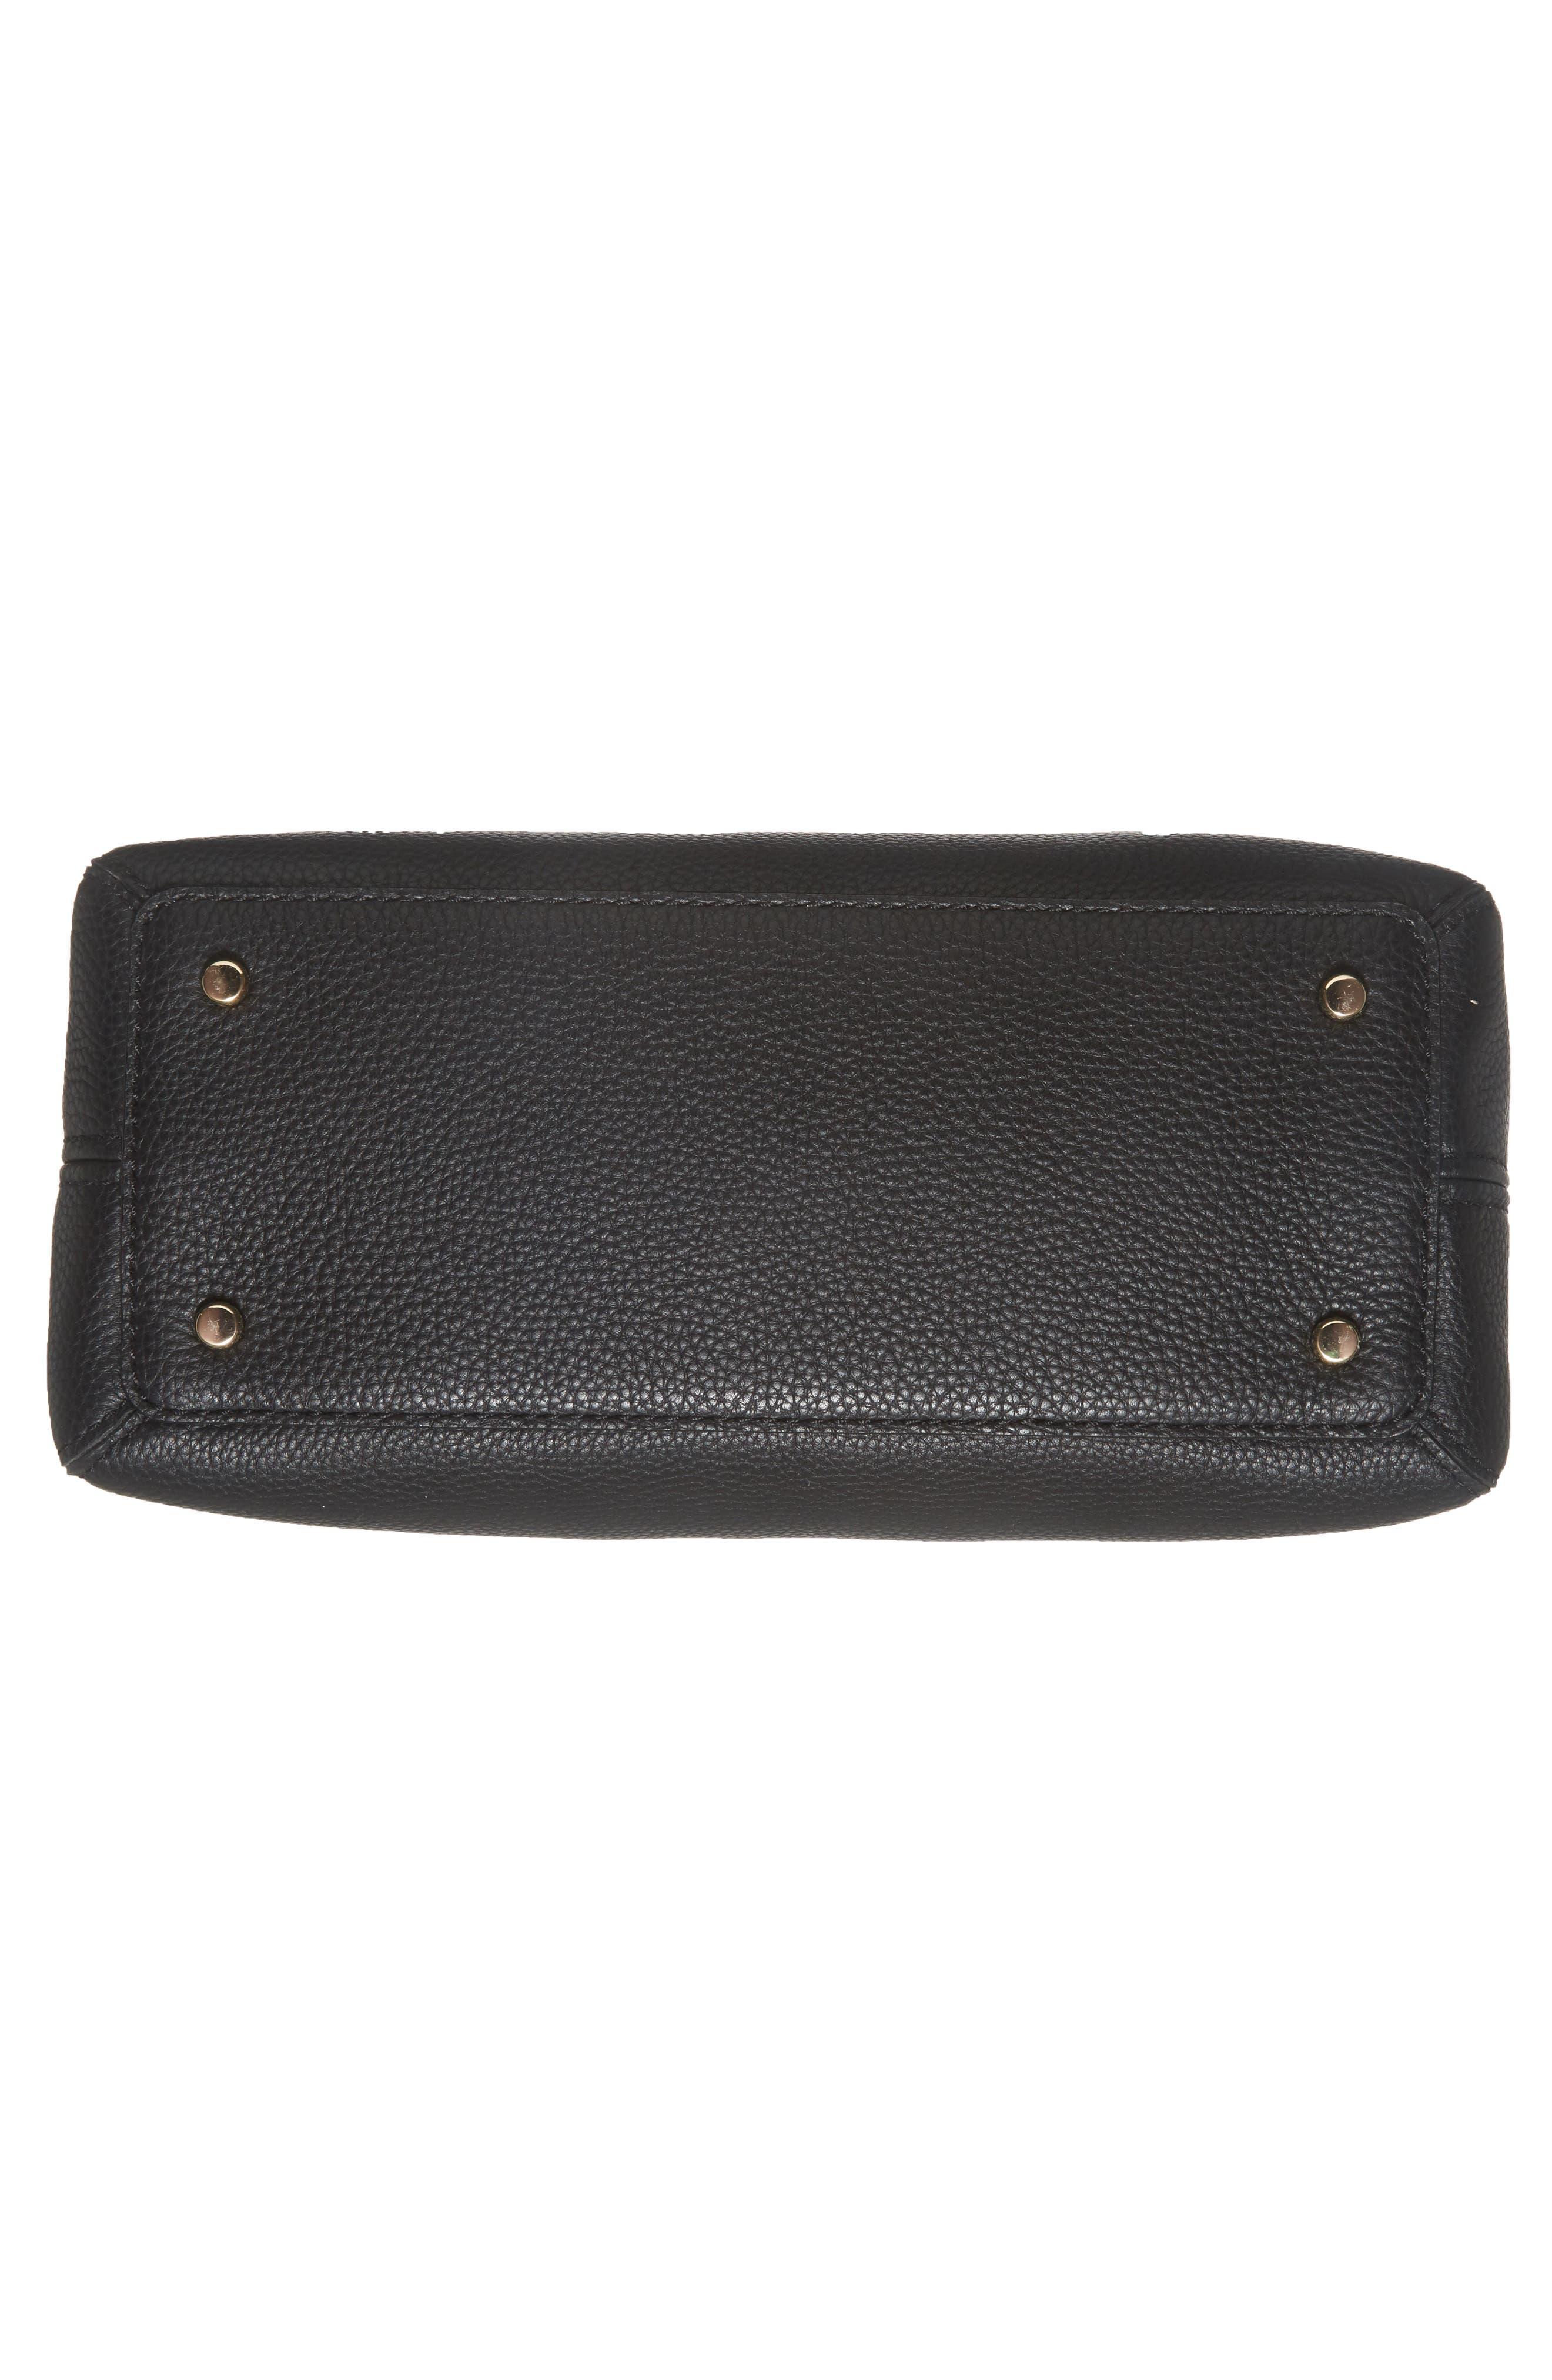 jackson street lottie leather satchel,                             Alternate thumbnail 5, color,                             Black